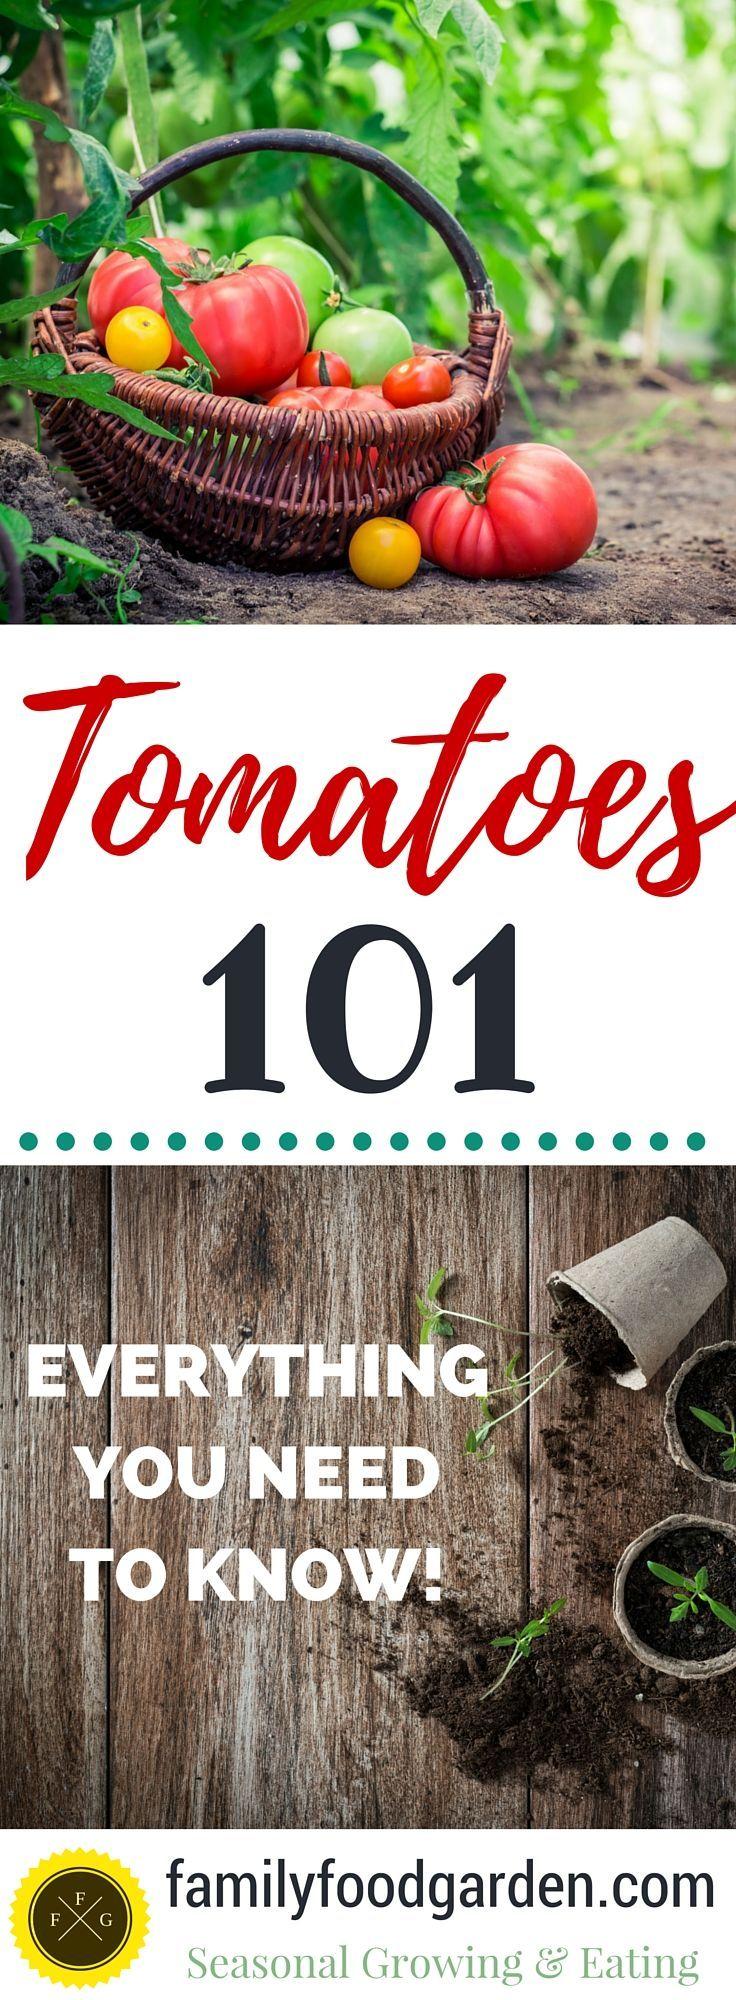 How to grow tomatoes, troubleshoot tomato diseases, trellis your tomatoes, preserve & eat!